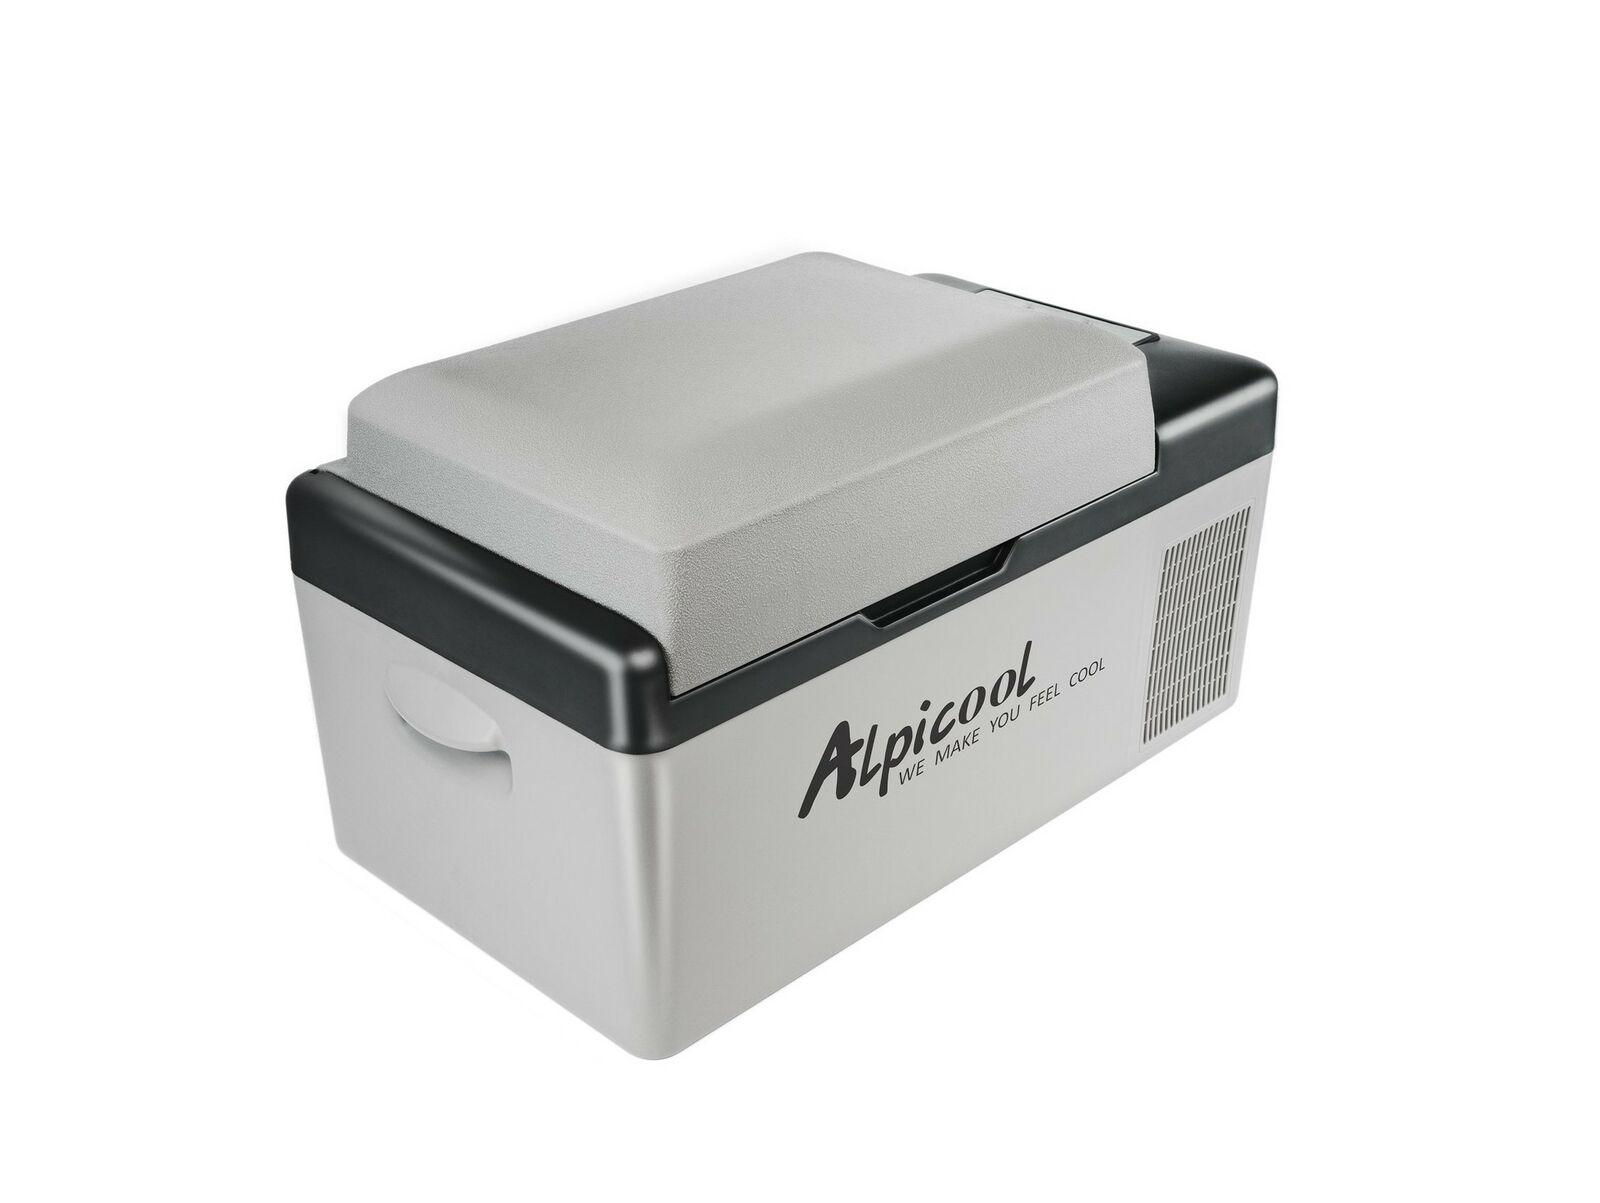 <strong>Alpicool Portable Refrigerator 21 Quart</strong>